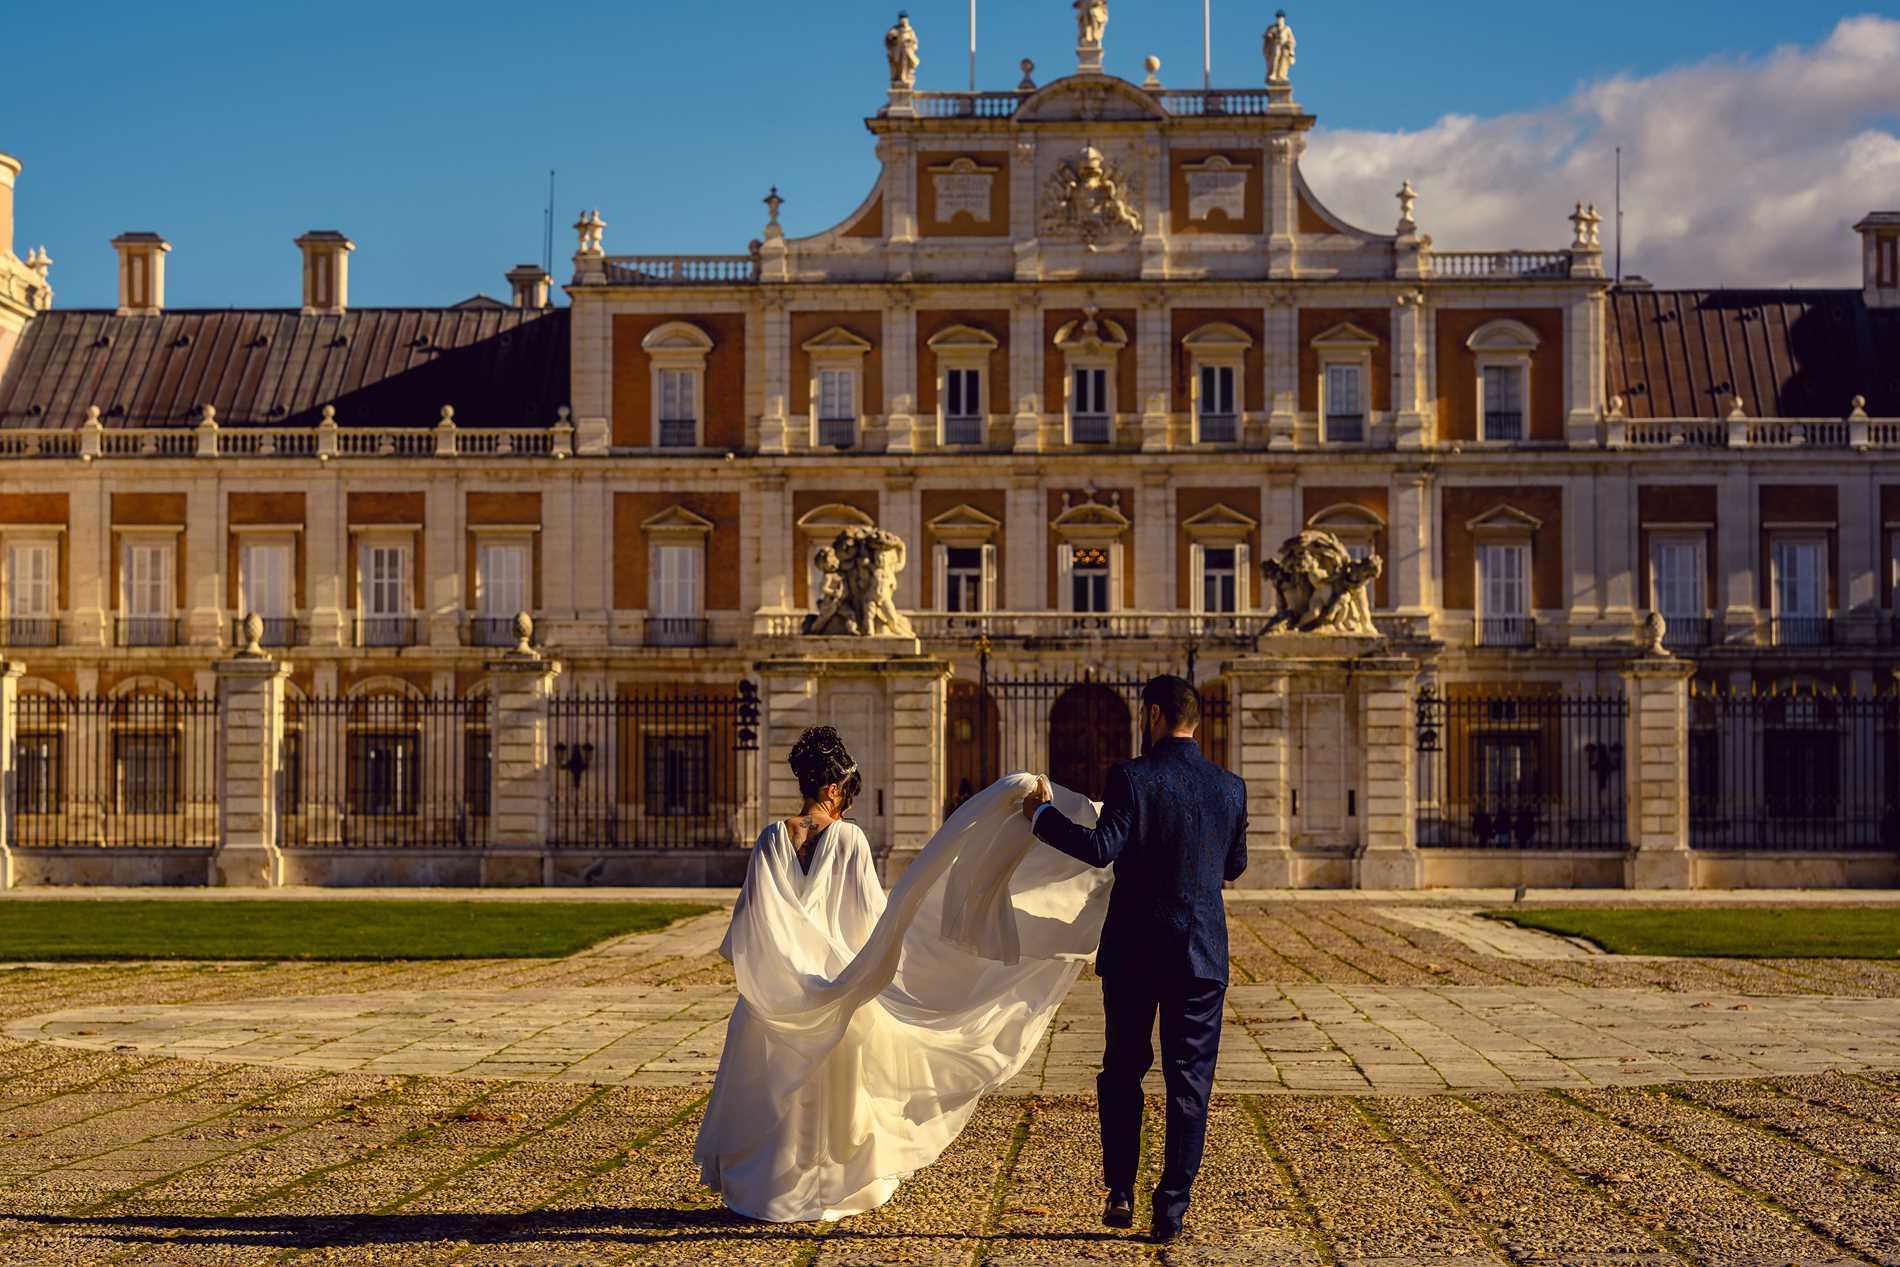 fotógrafo de bodas en Aranjuez - Palacio Real